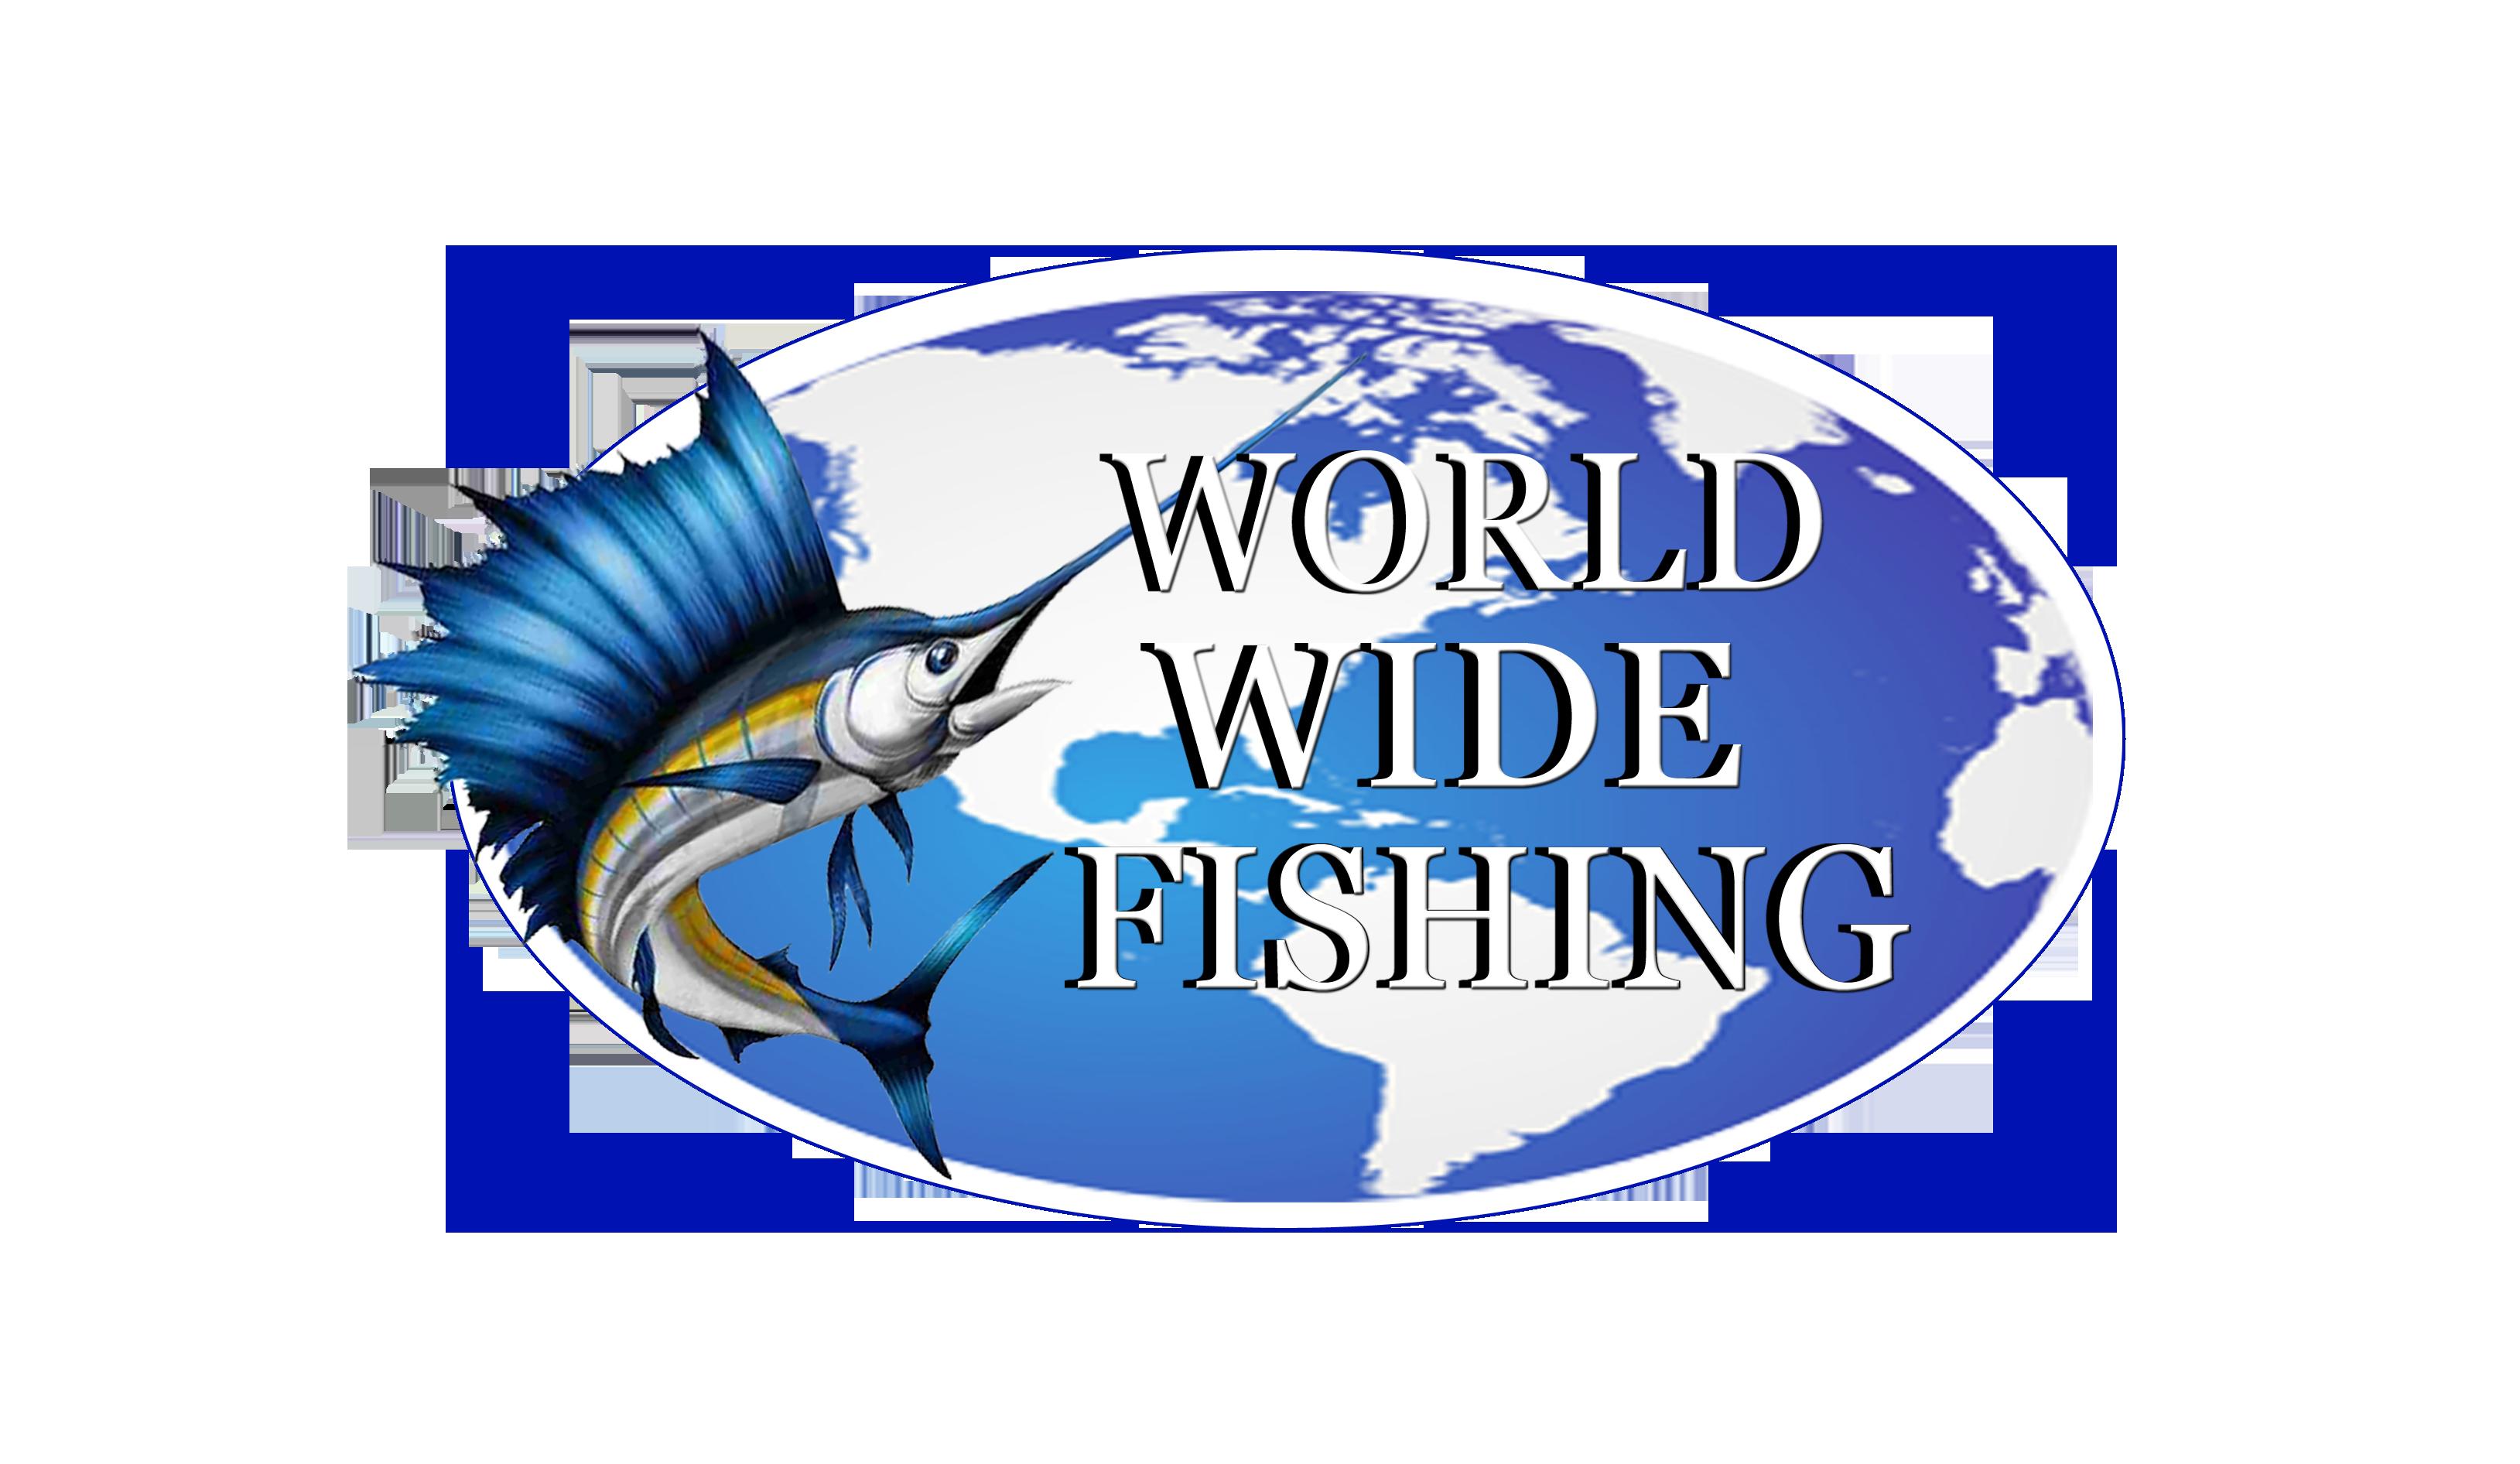 World Wide Fishing Guide